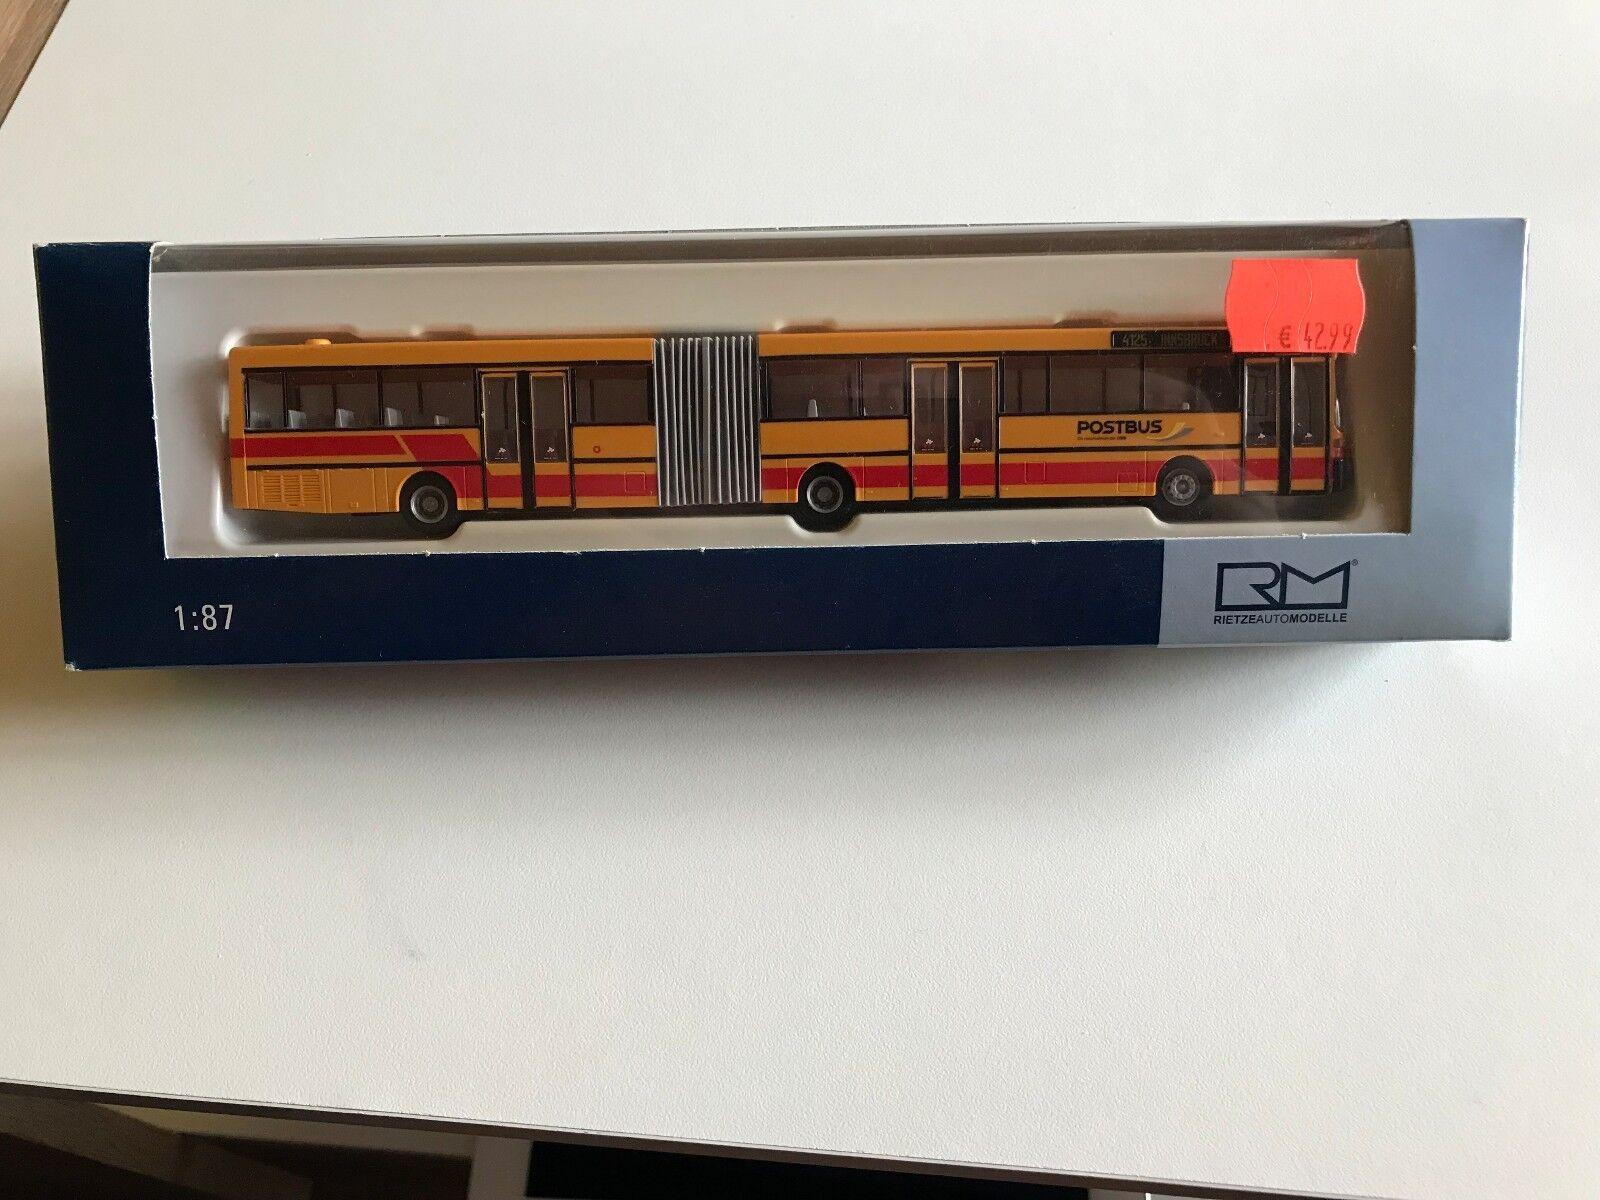 Rietze mb-0 405 G Nº 69809 neuf, emballage d'origine